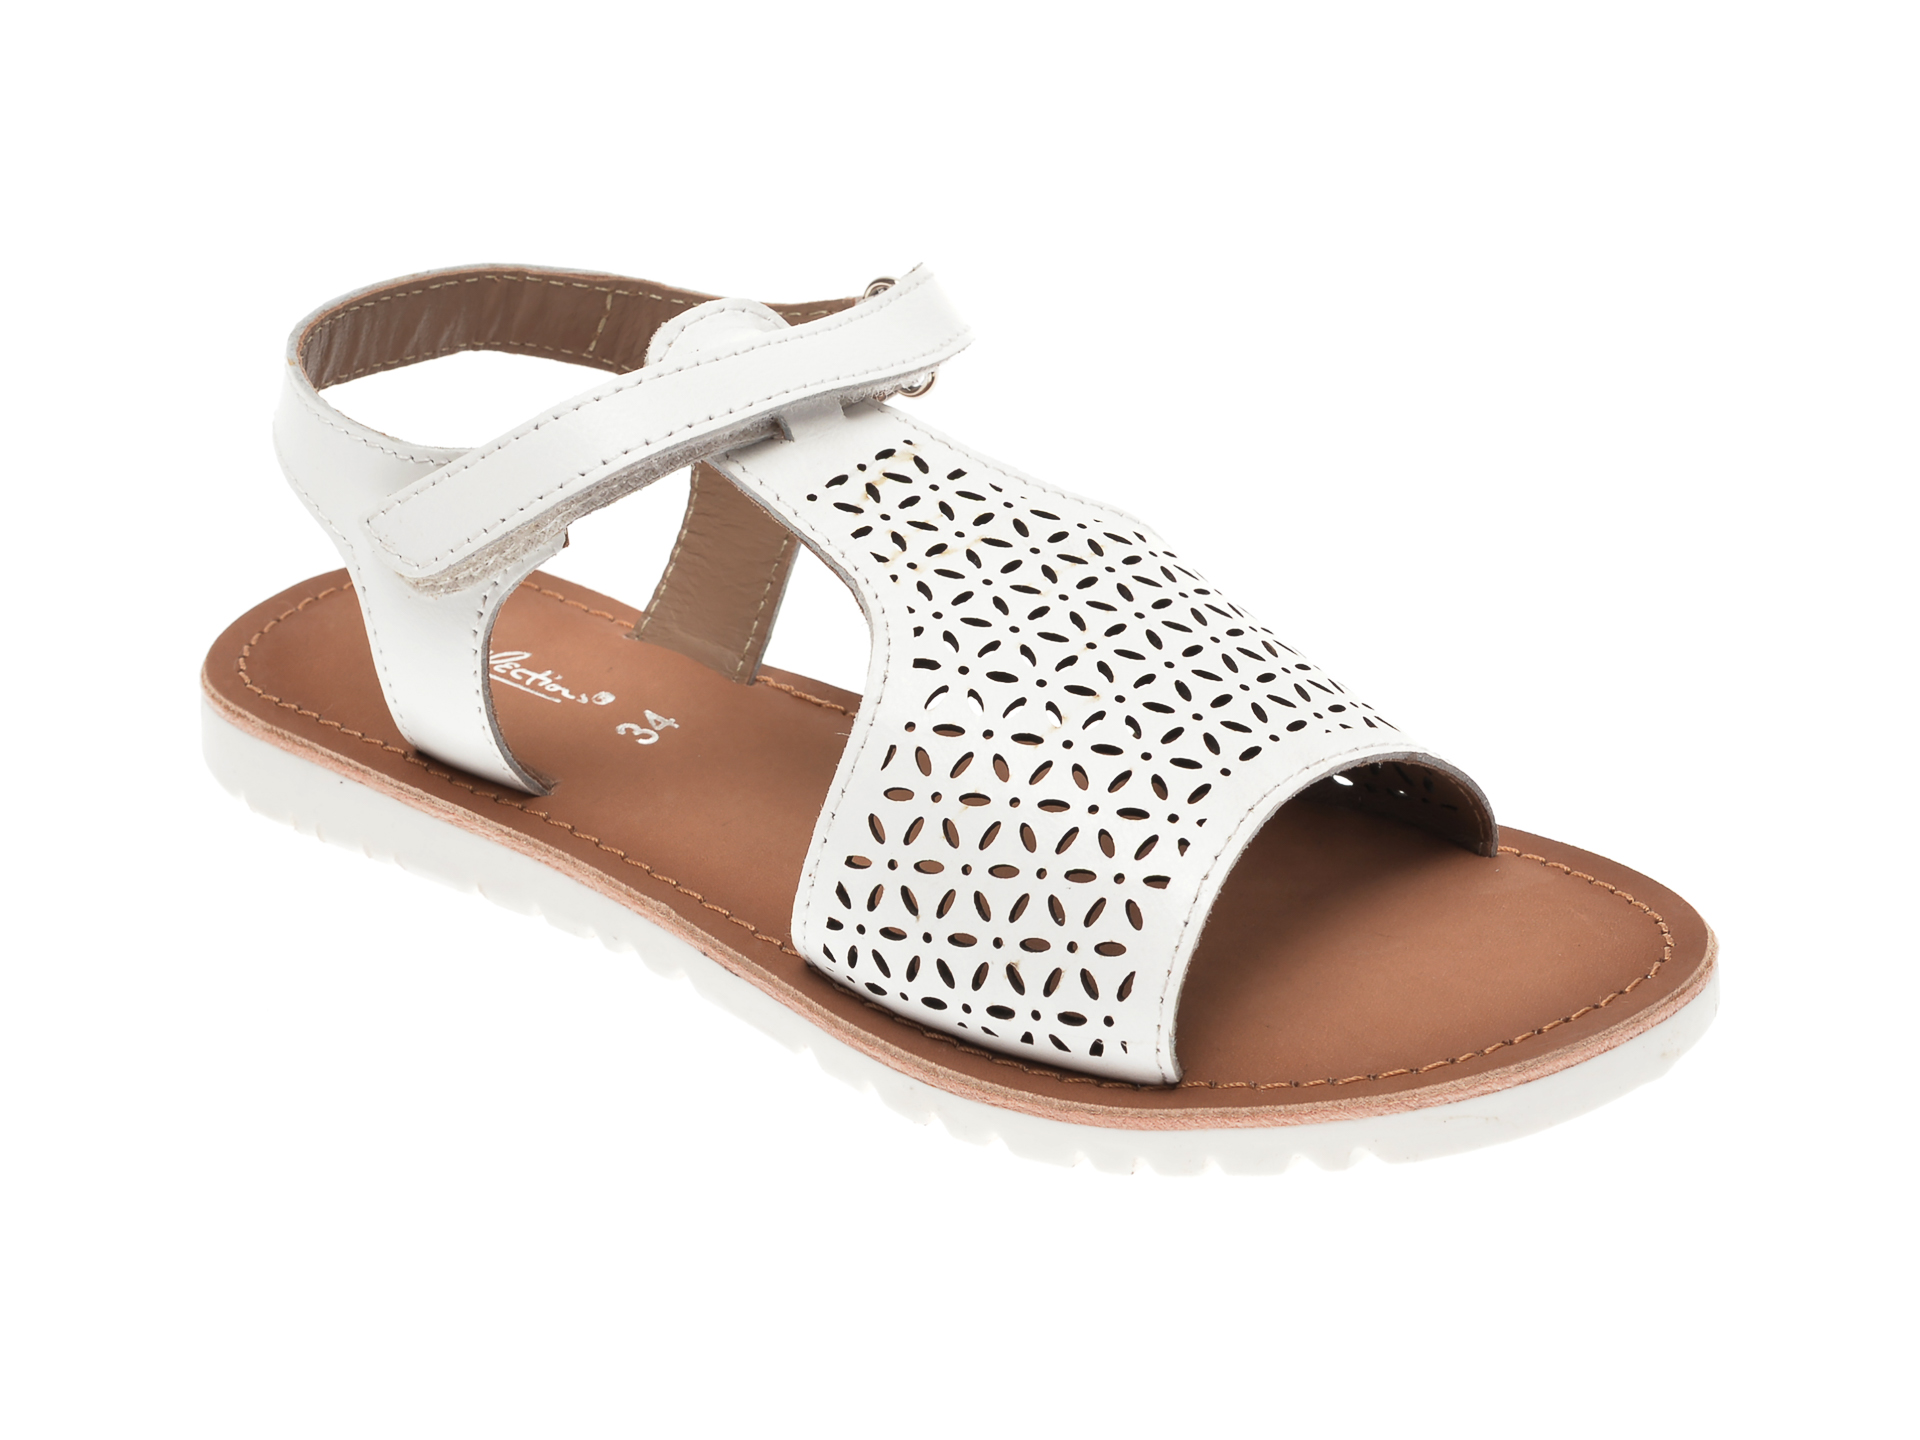 Sandale SELECTION KIDS albe, SH22, din piele naturala